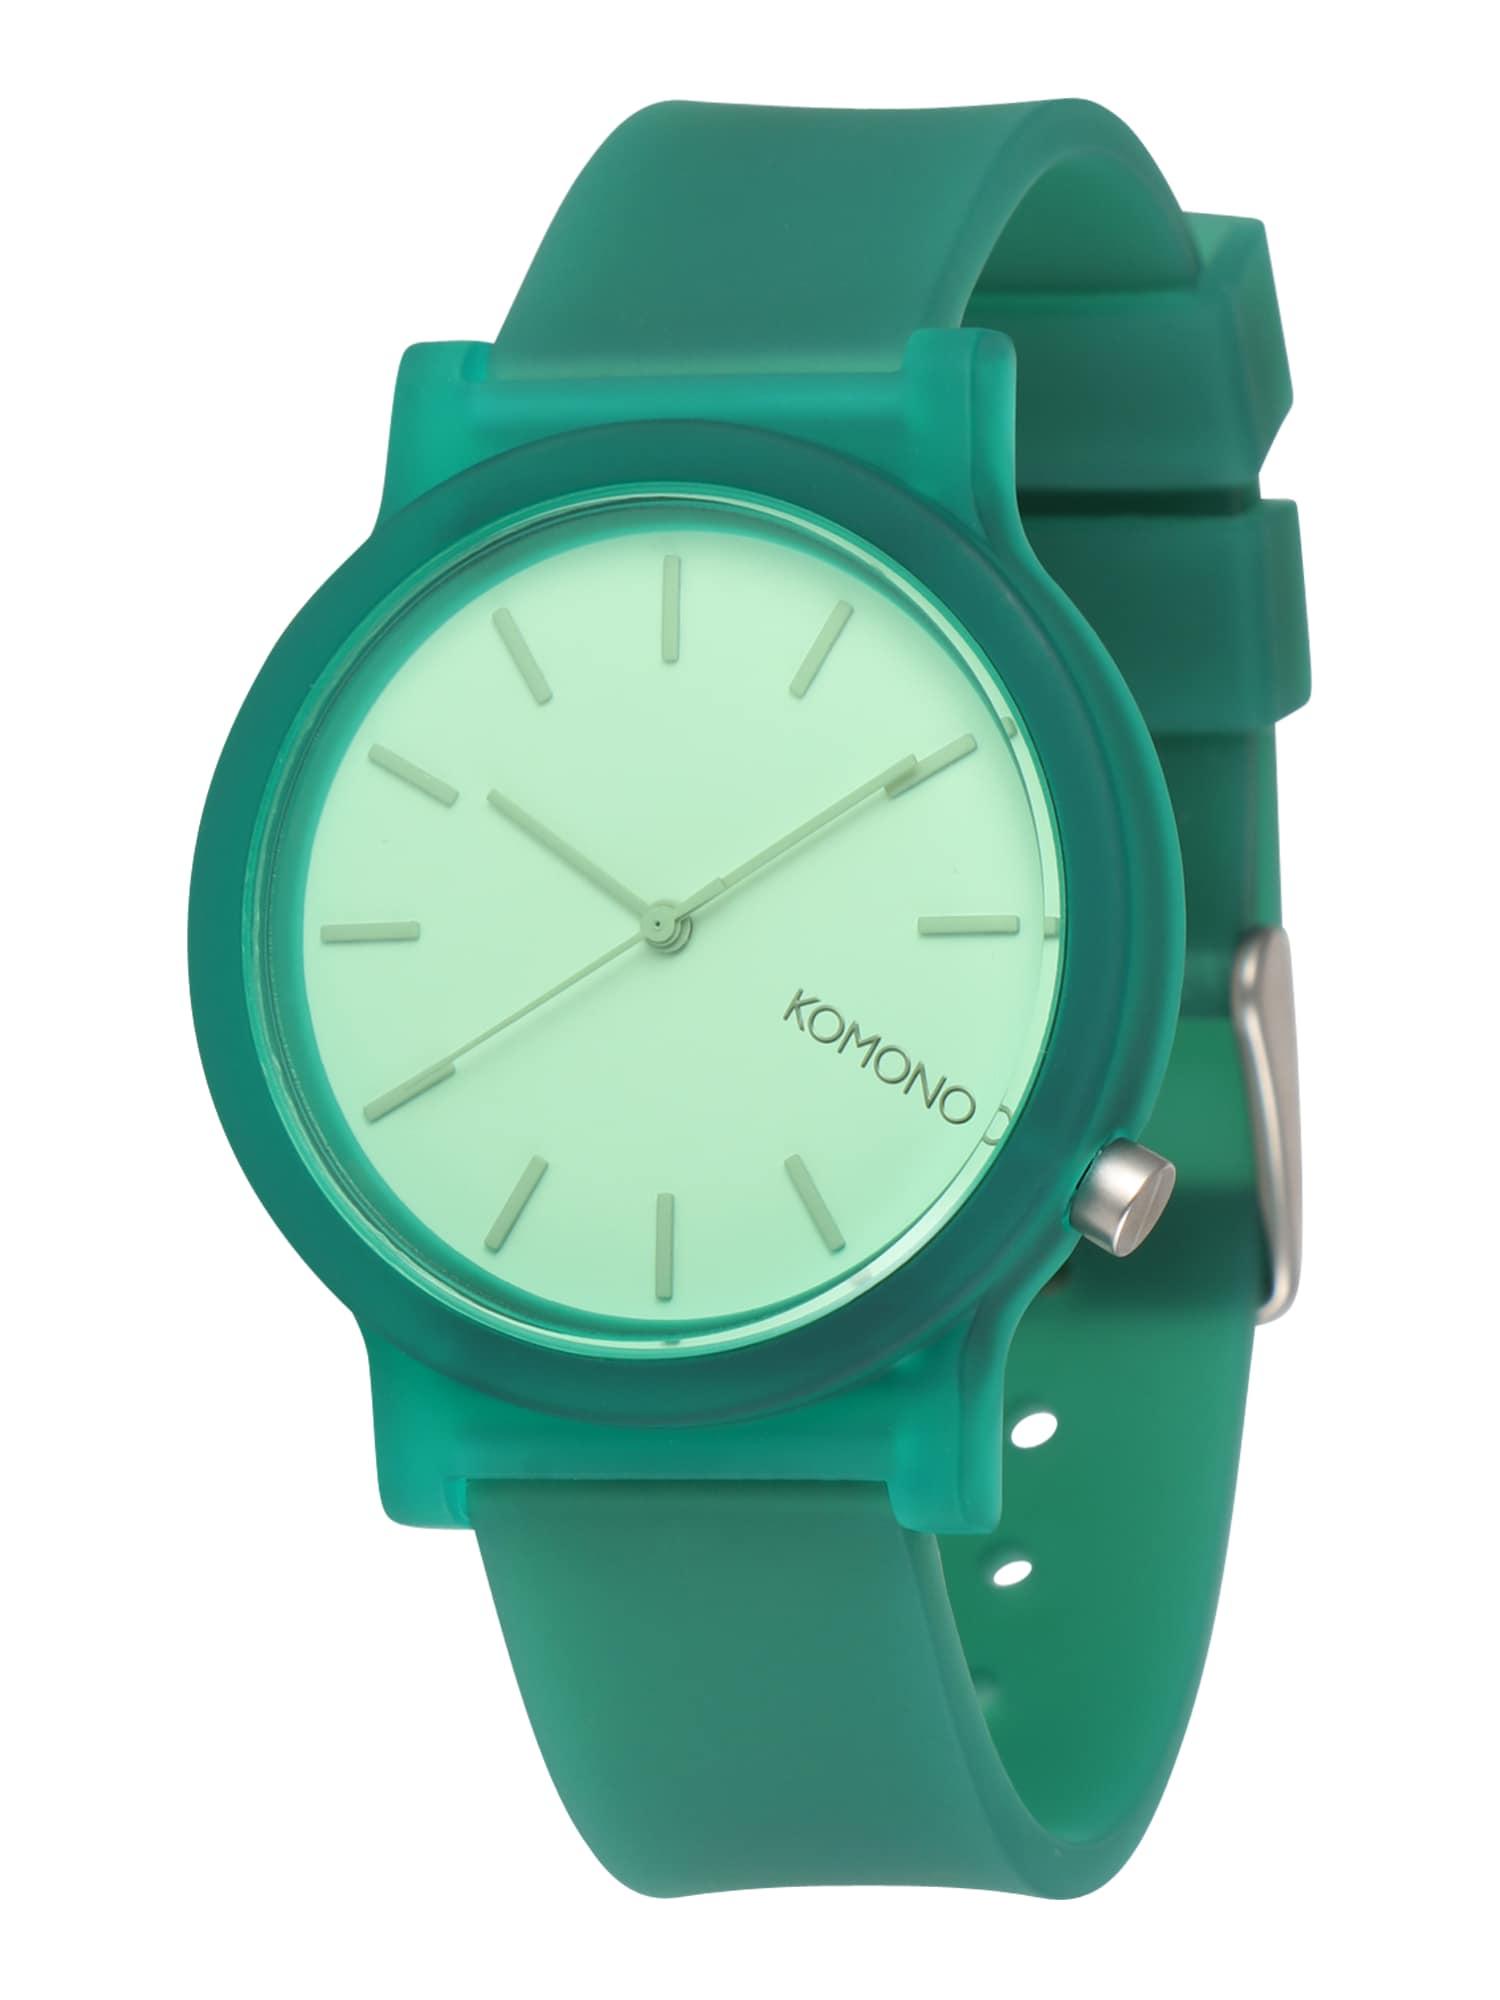 Analogové hodinky MONO zelená Komono